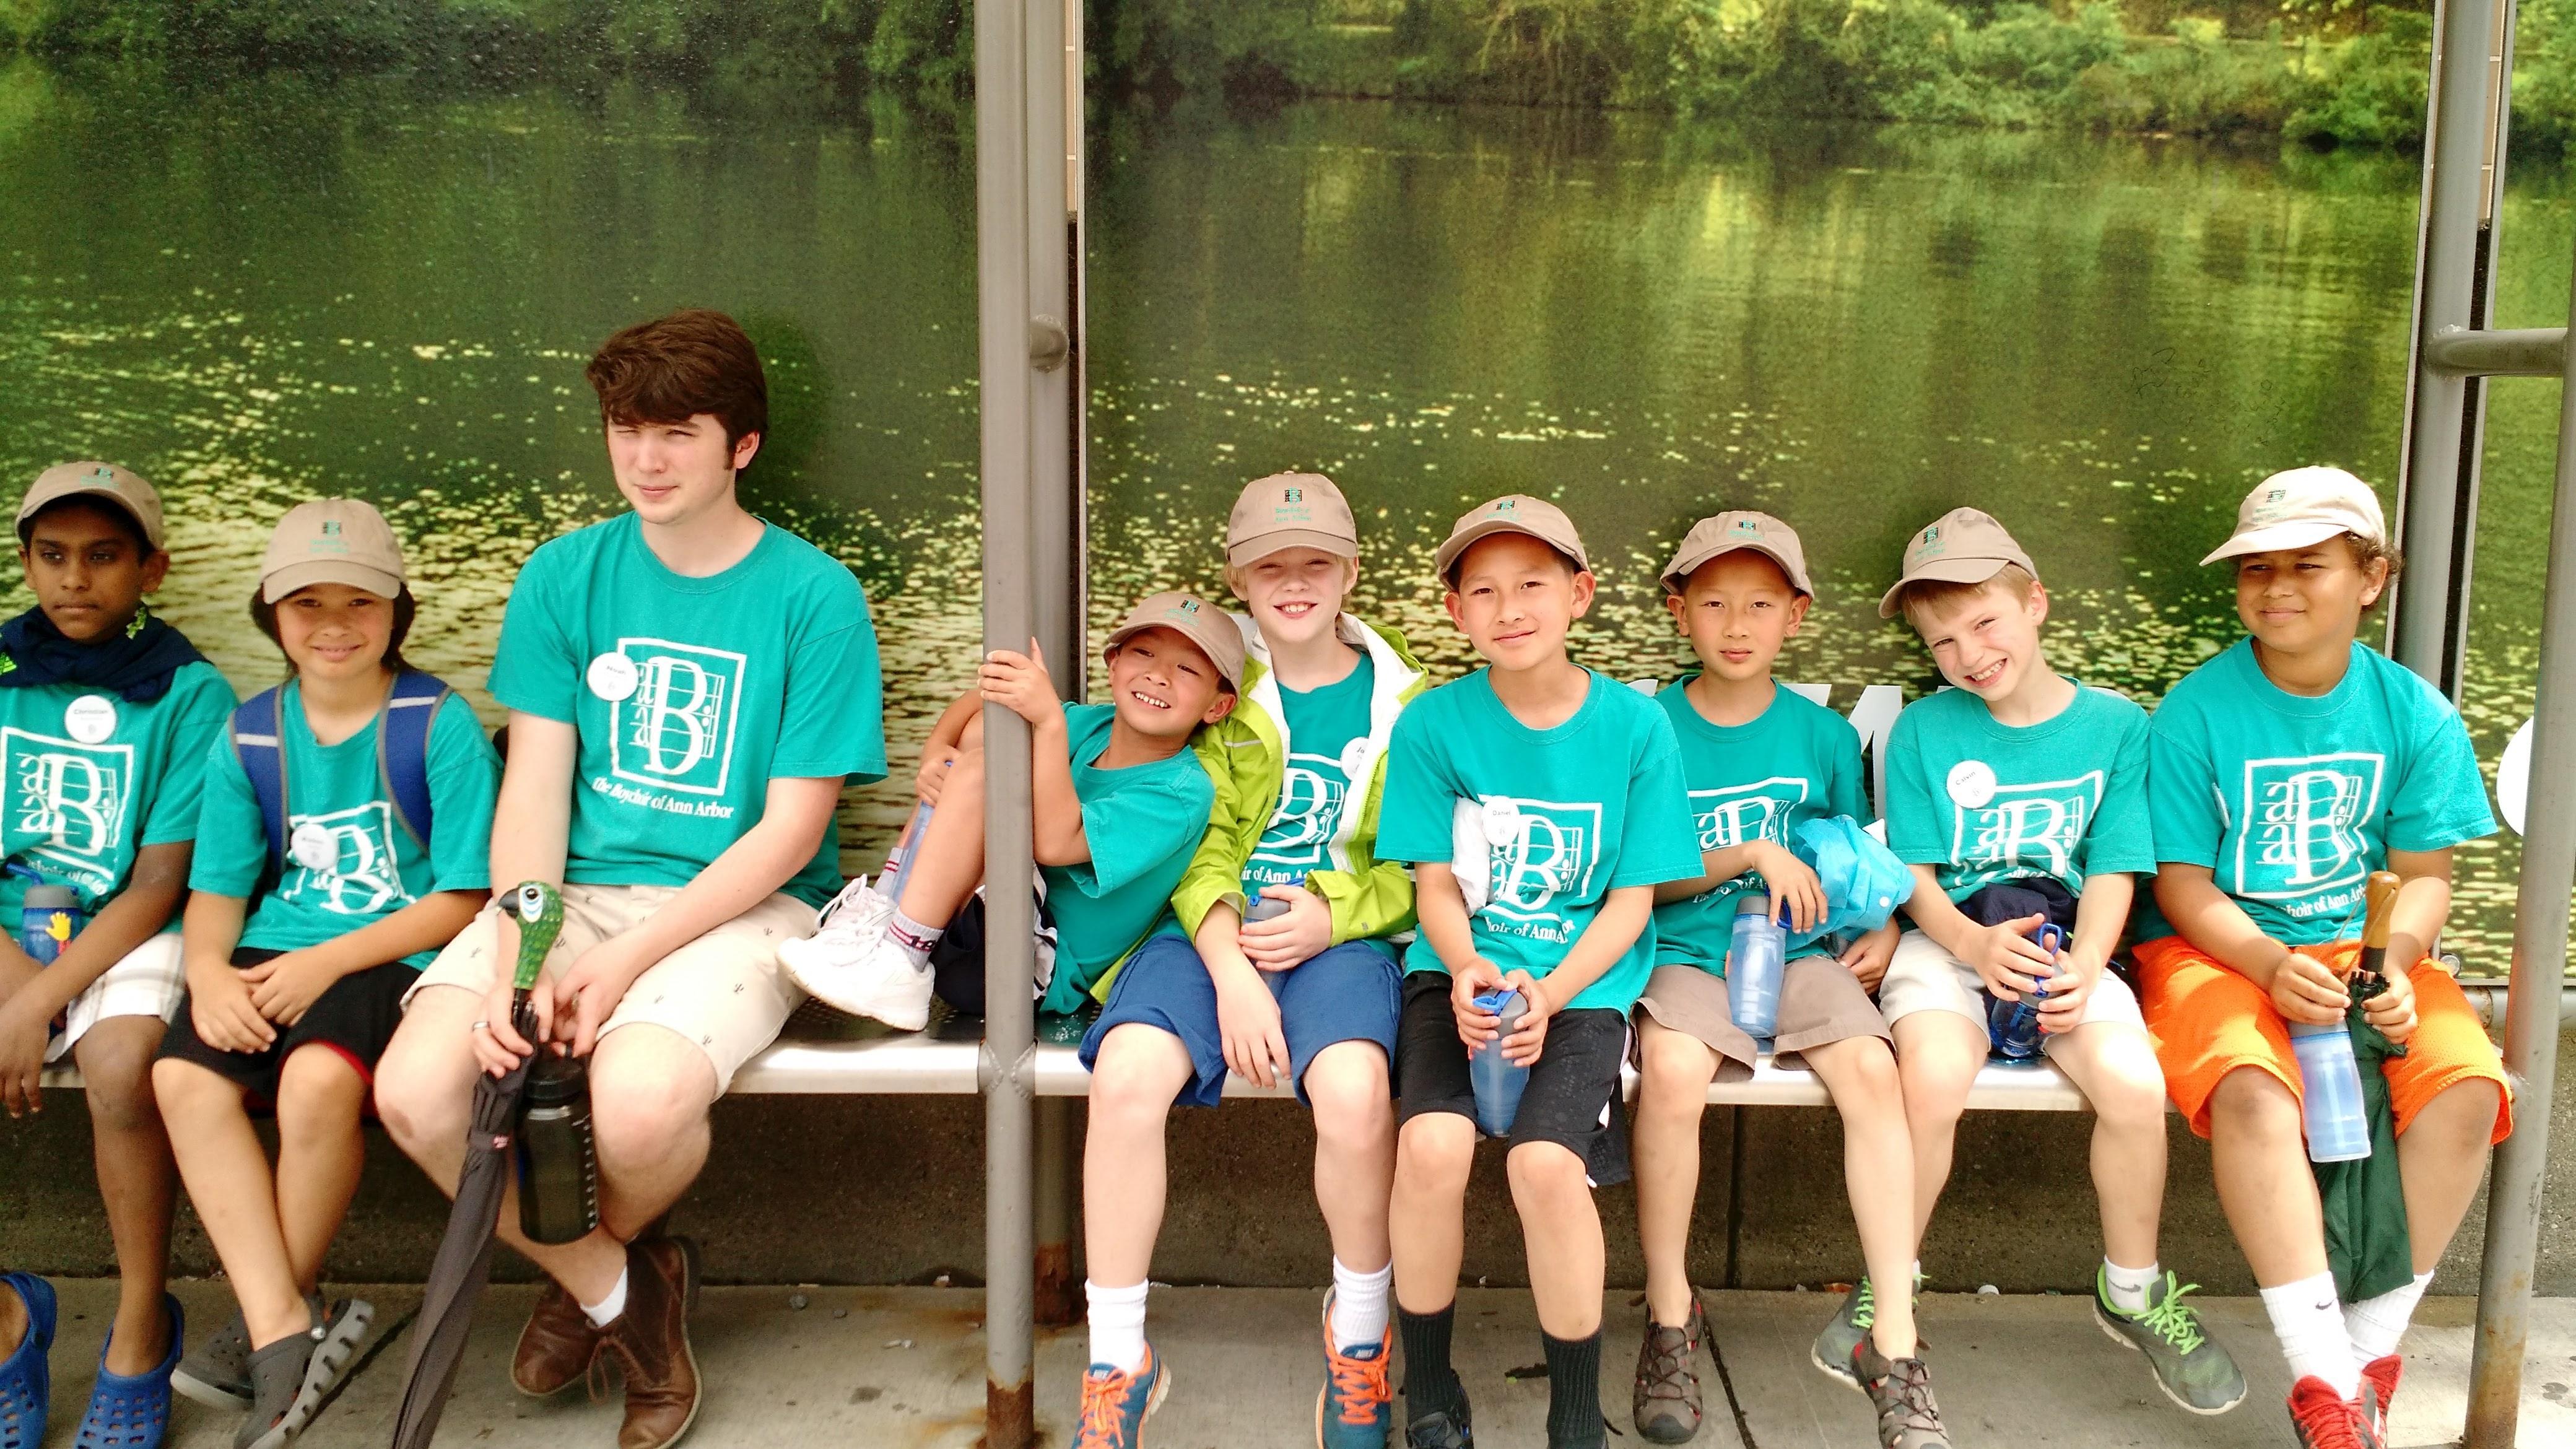 Boys' Summer Singing Camp 2017 | Ann Arbor, MI | St Clare's Episcopal Church | June 19, 2017